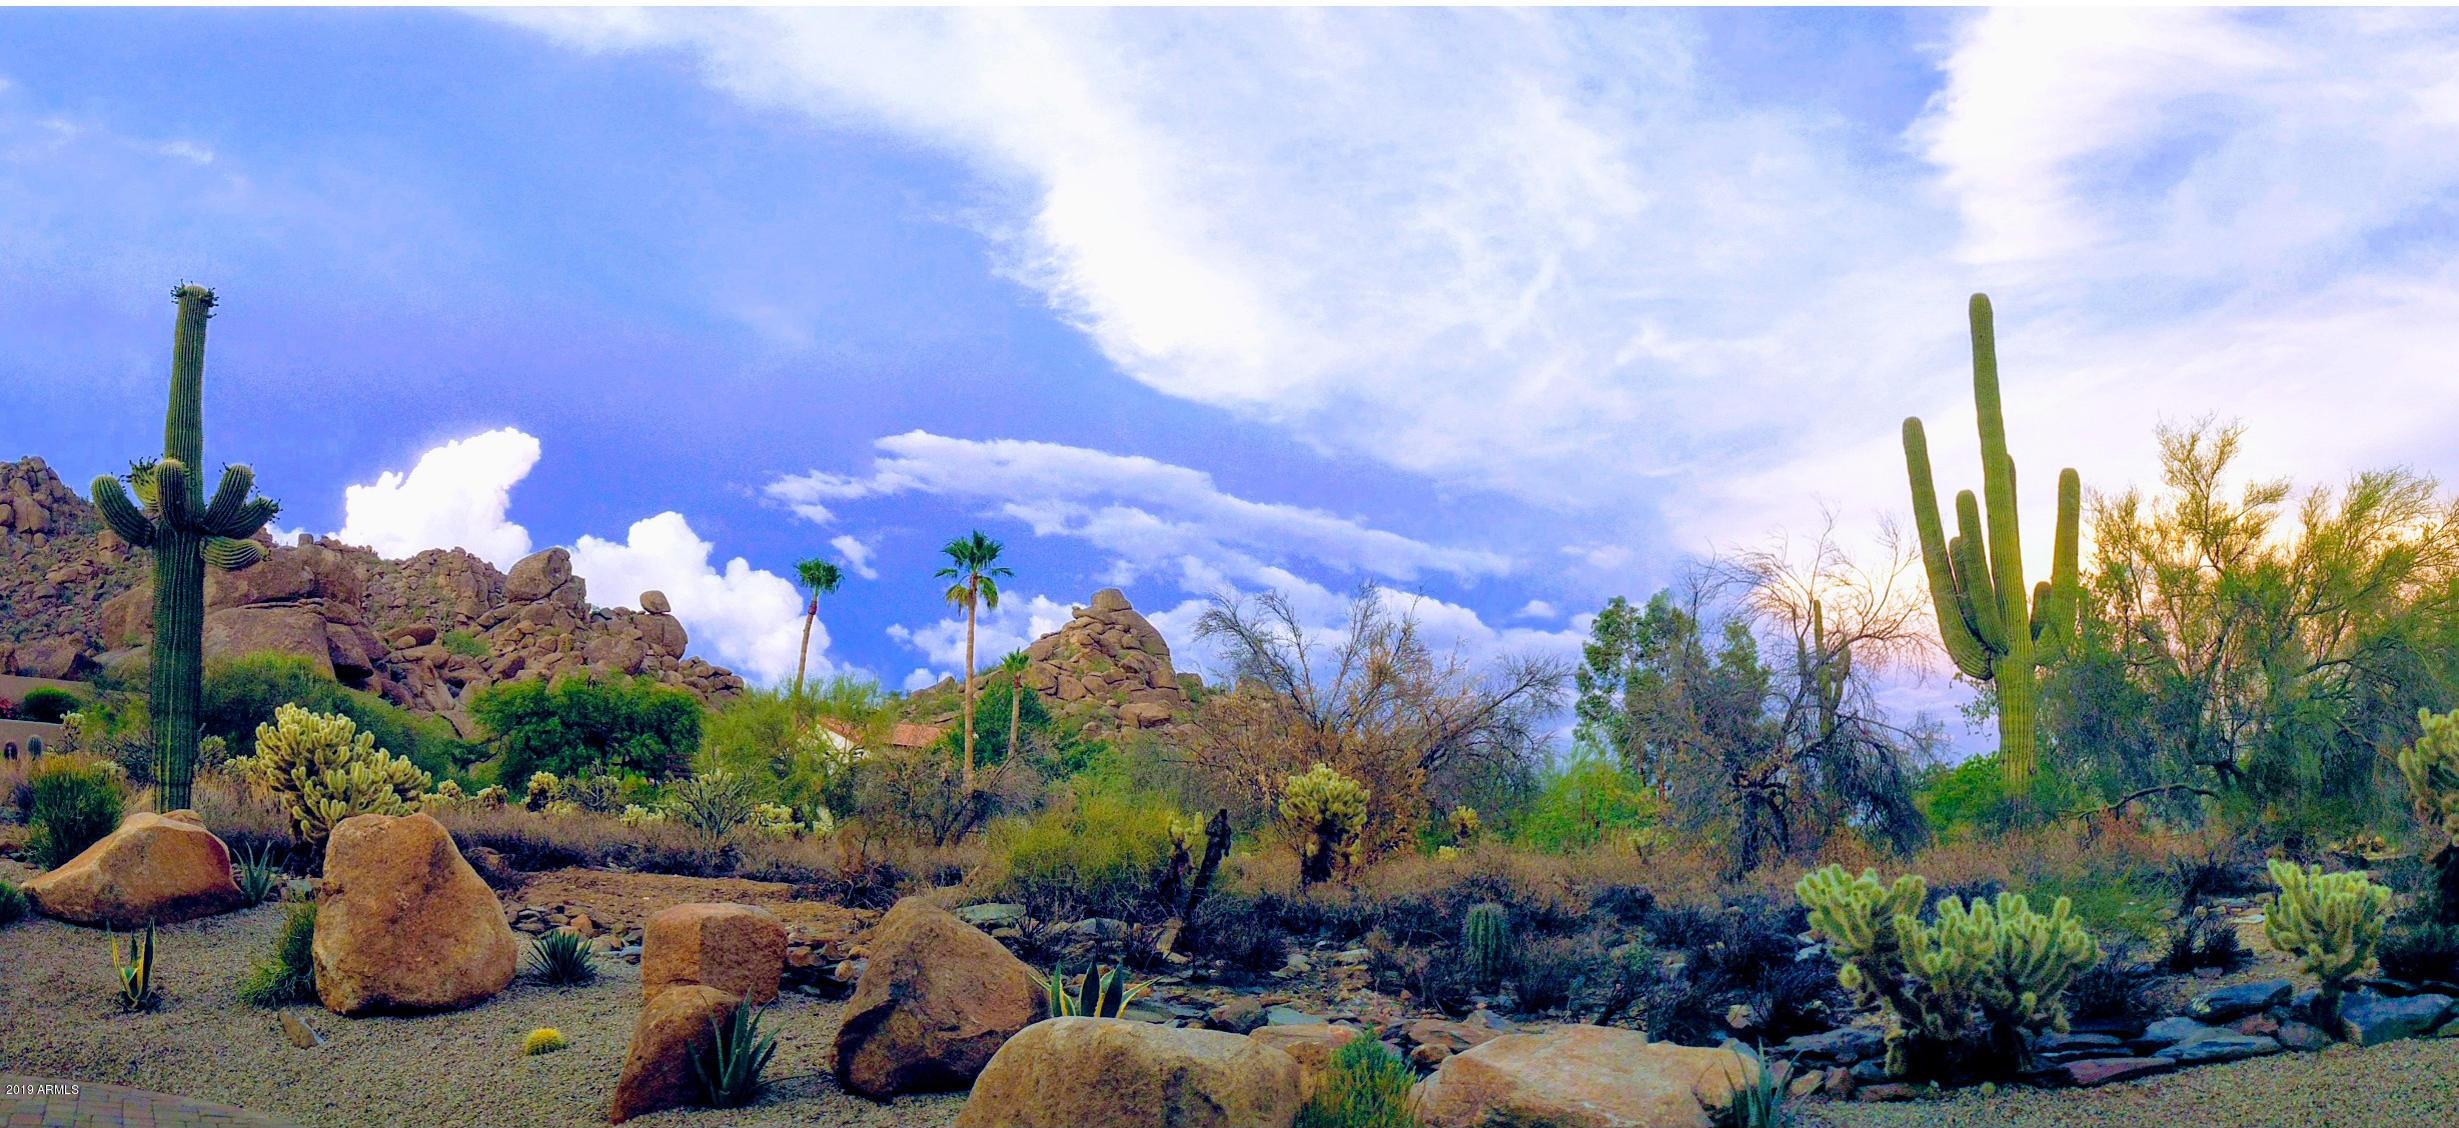 MLS 5841657 6616 E EL SENDERO Road, Carefree, AZ 85377 Carefree AZ Private Pool